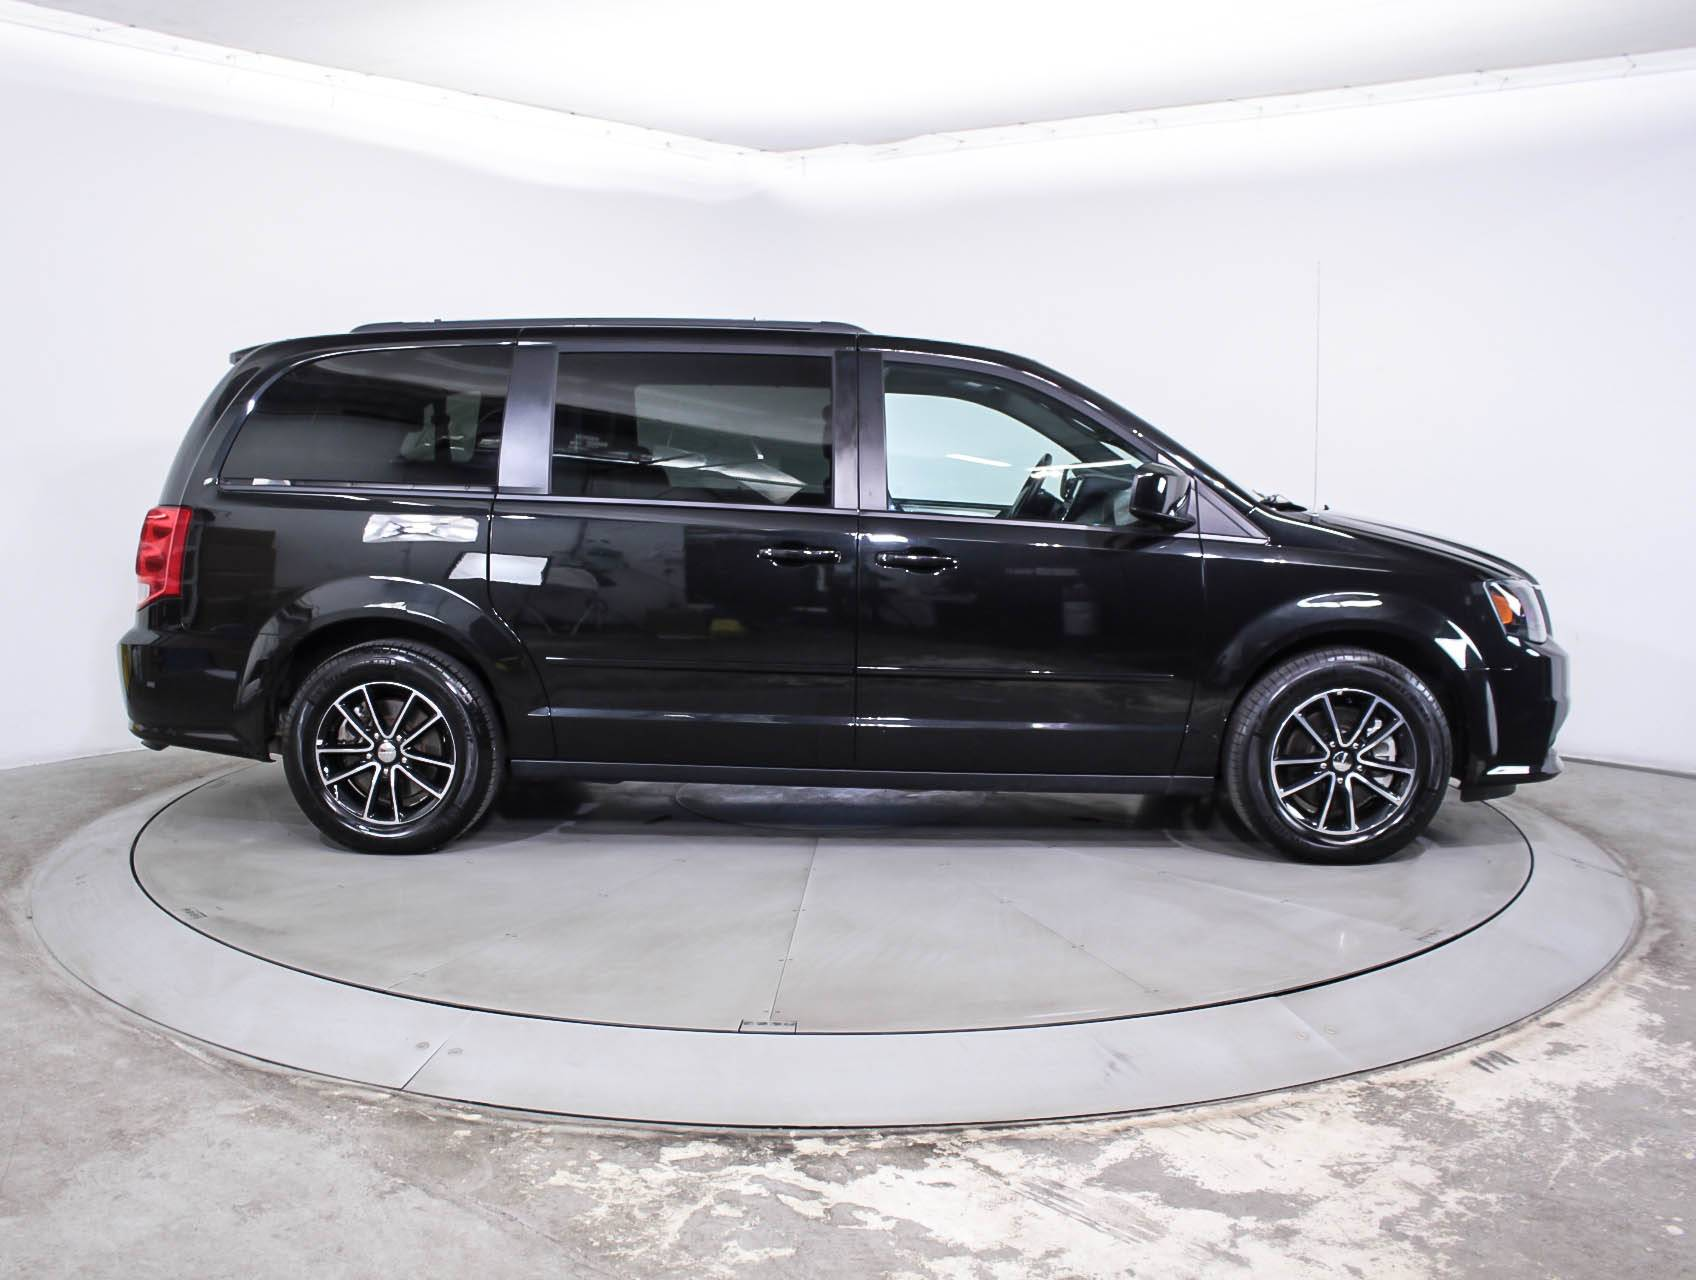 Used 2017 Dodge Grand Caravan Gt Minivan For Sale In